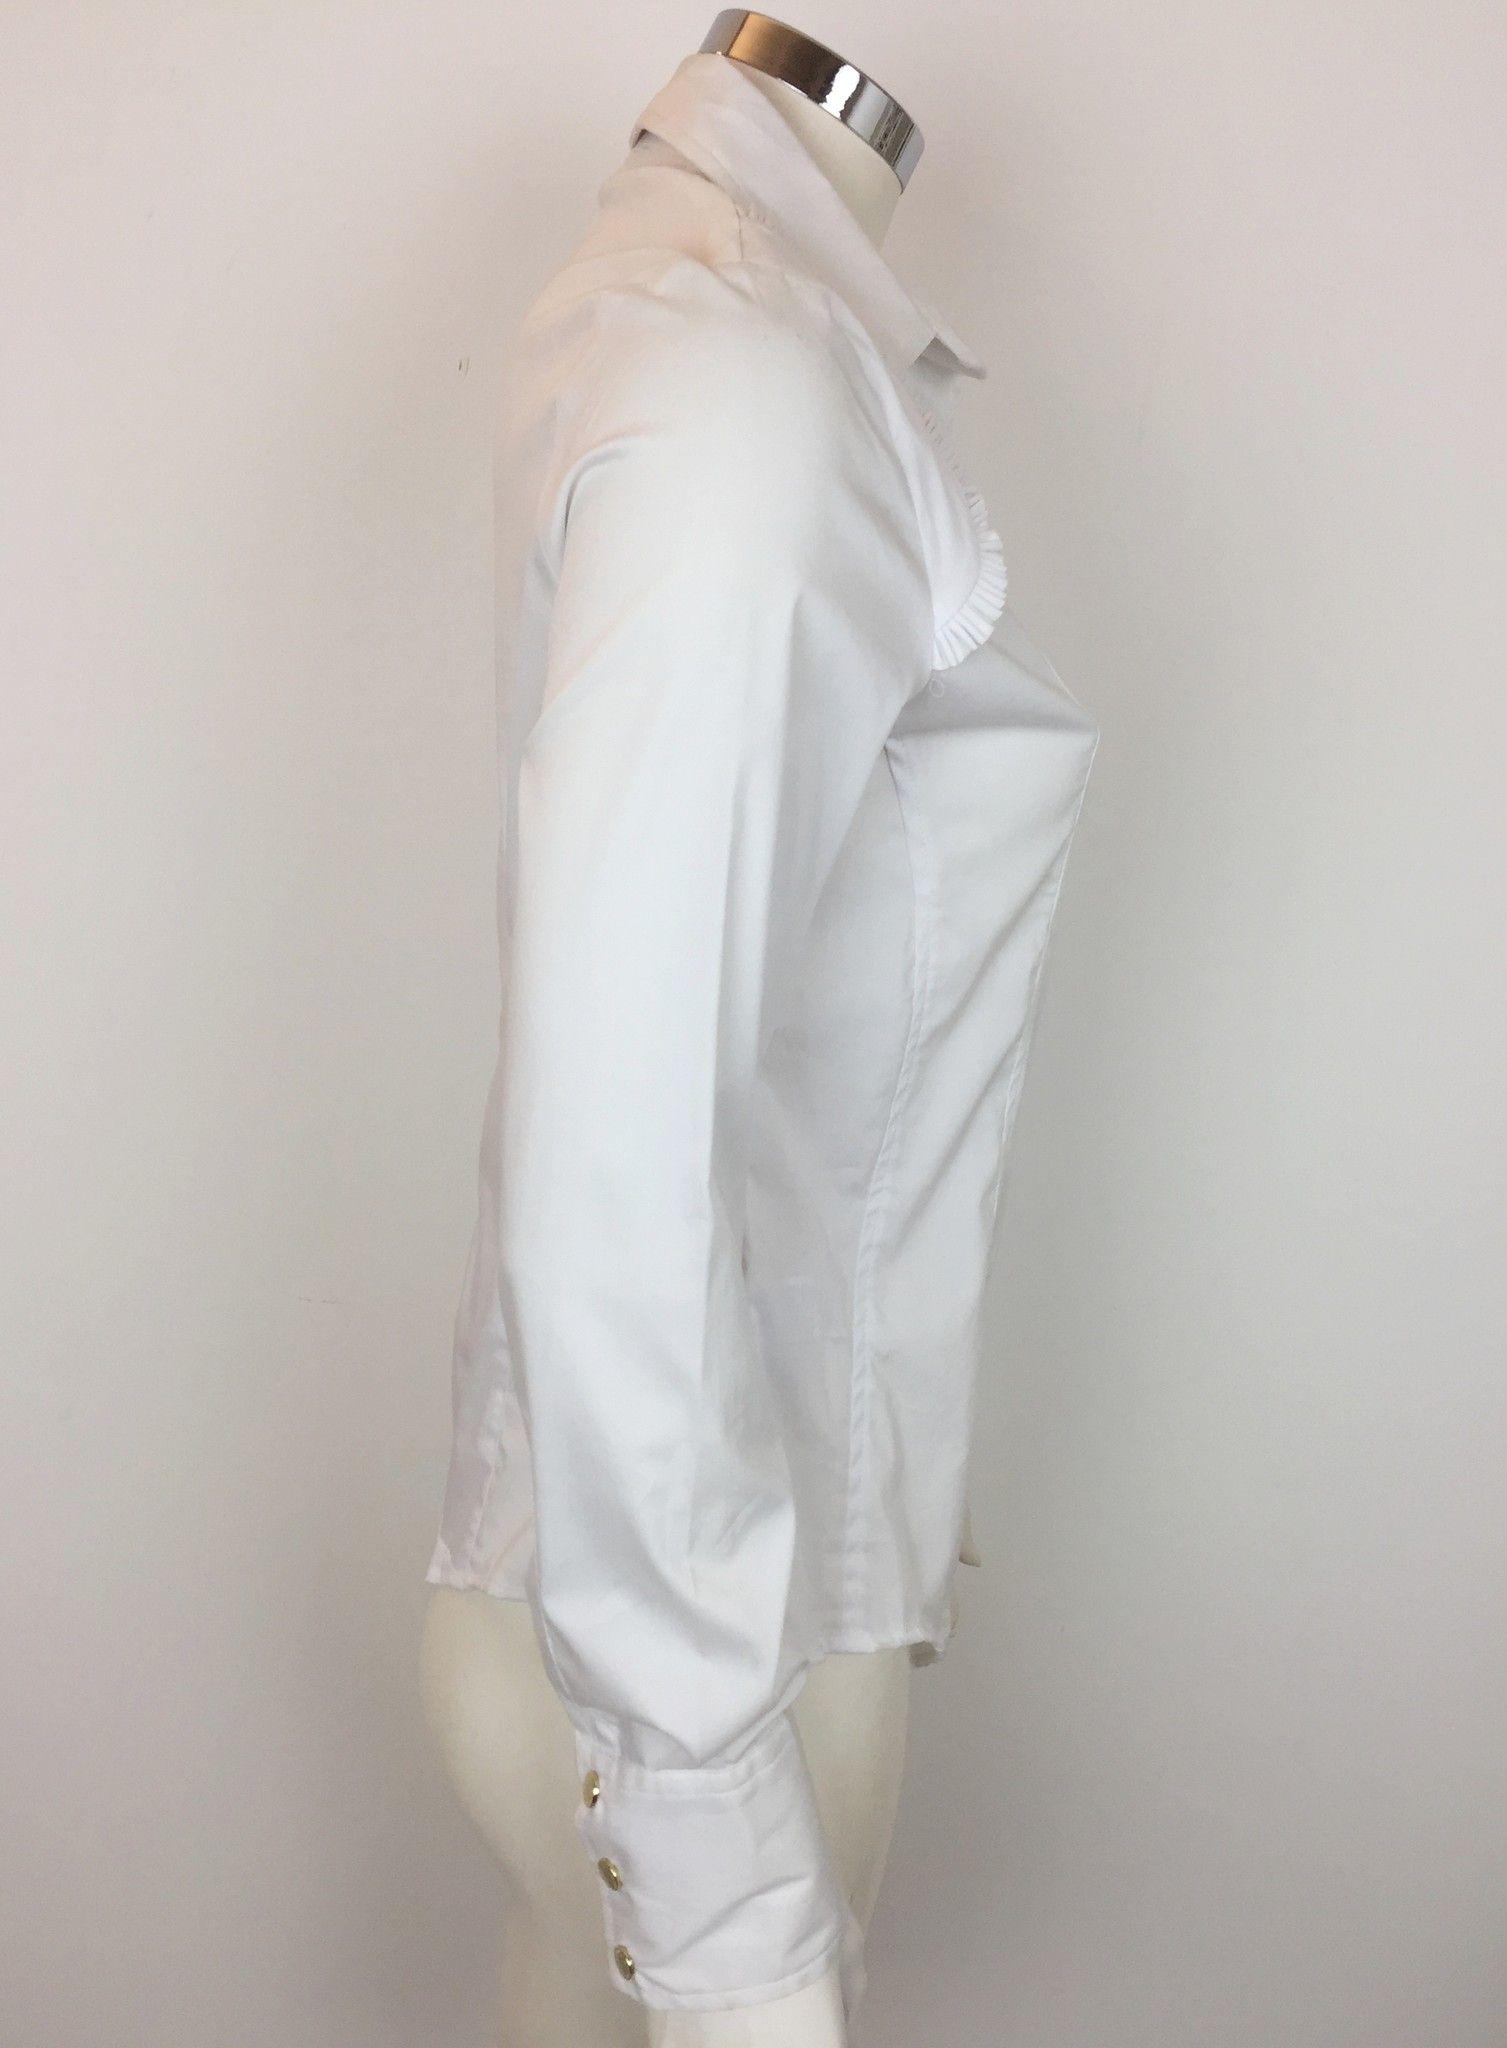 Roberta Biagi Body-Shirt with Golden Trim Cod.CAM0269